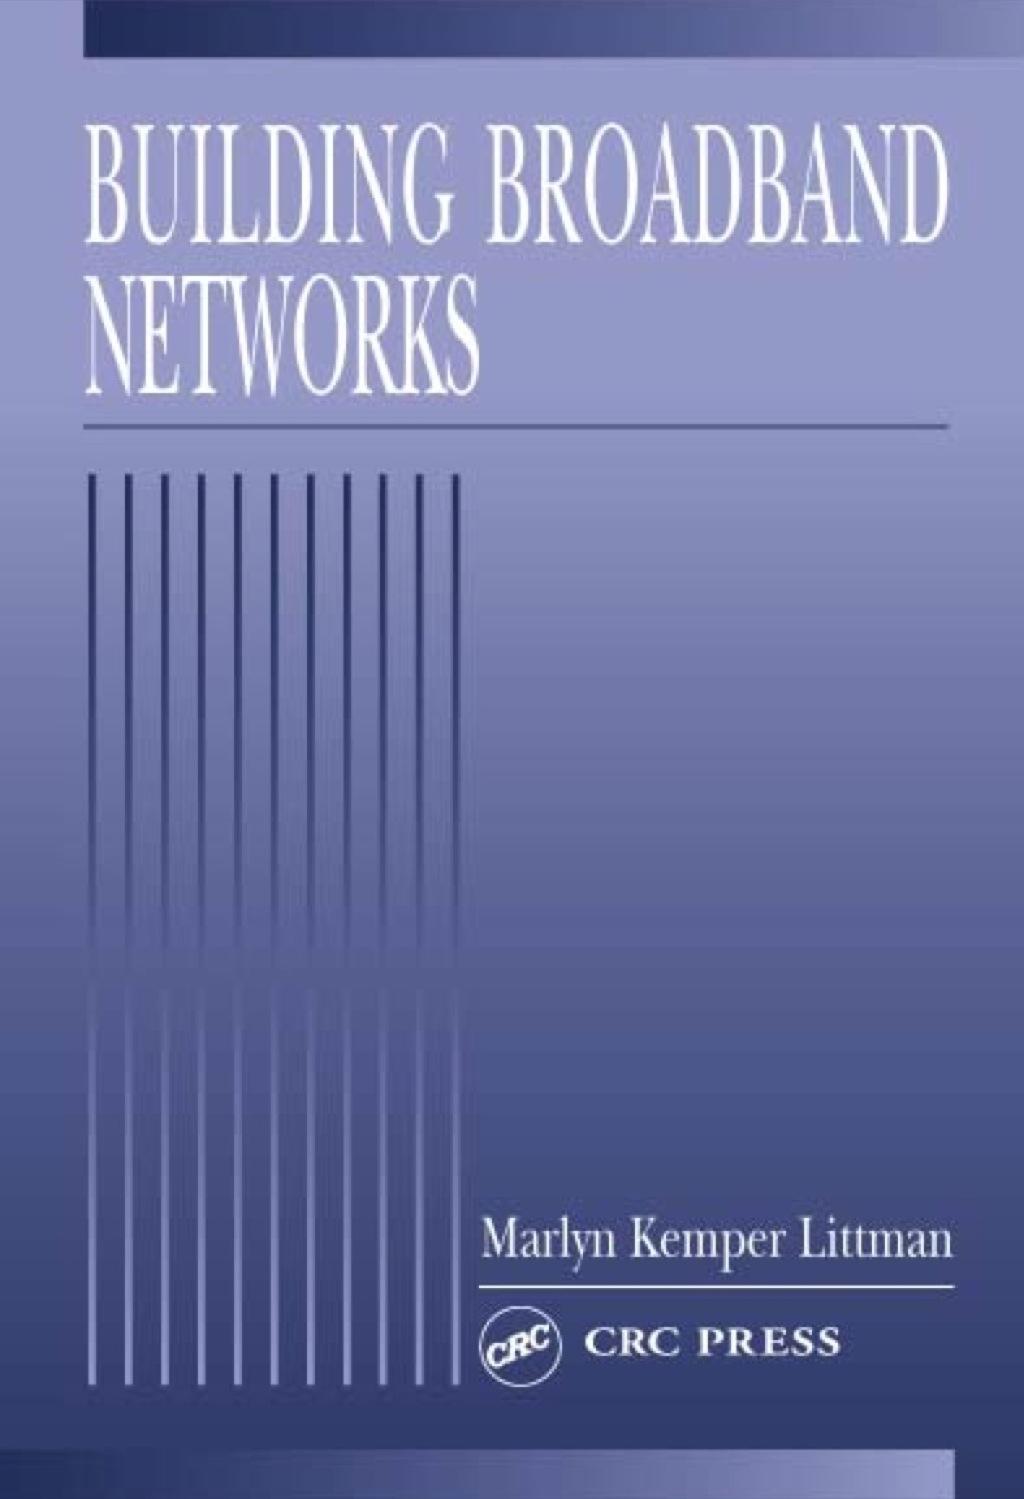 ISBN 9781420000016 product image for Building Broadband Networks (eBook Rental) | upcitemdb.com